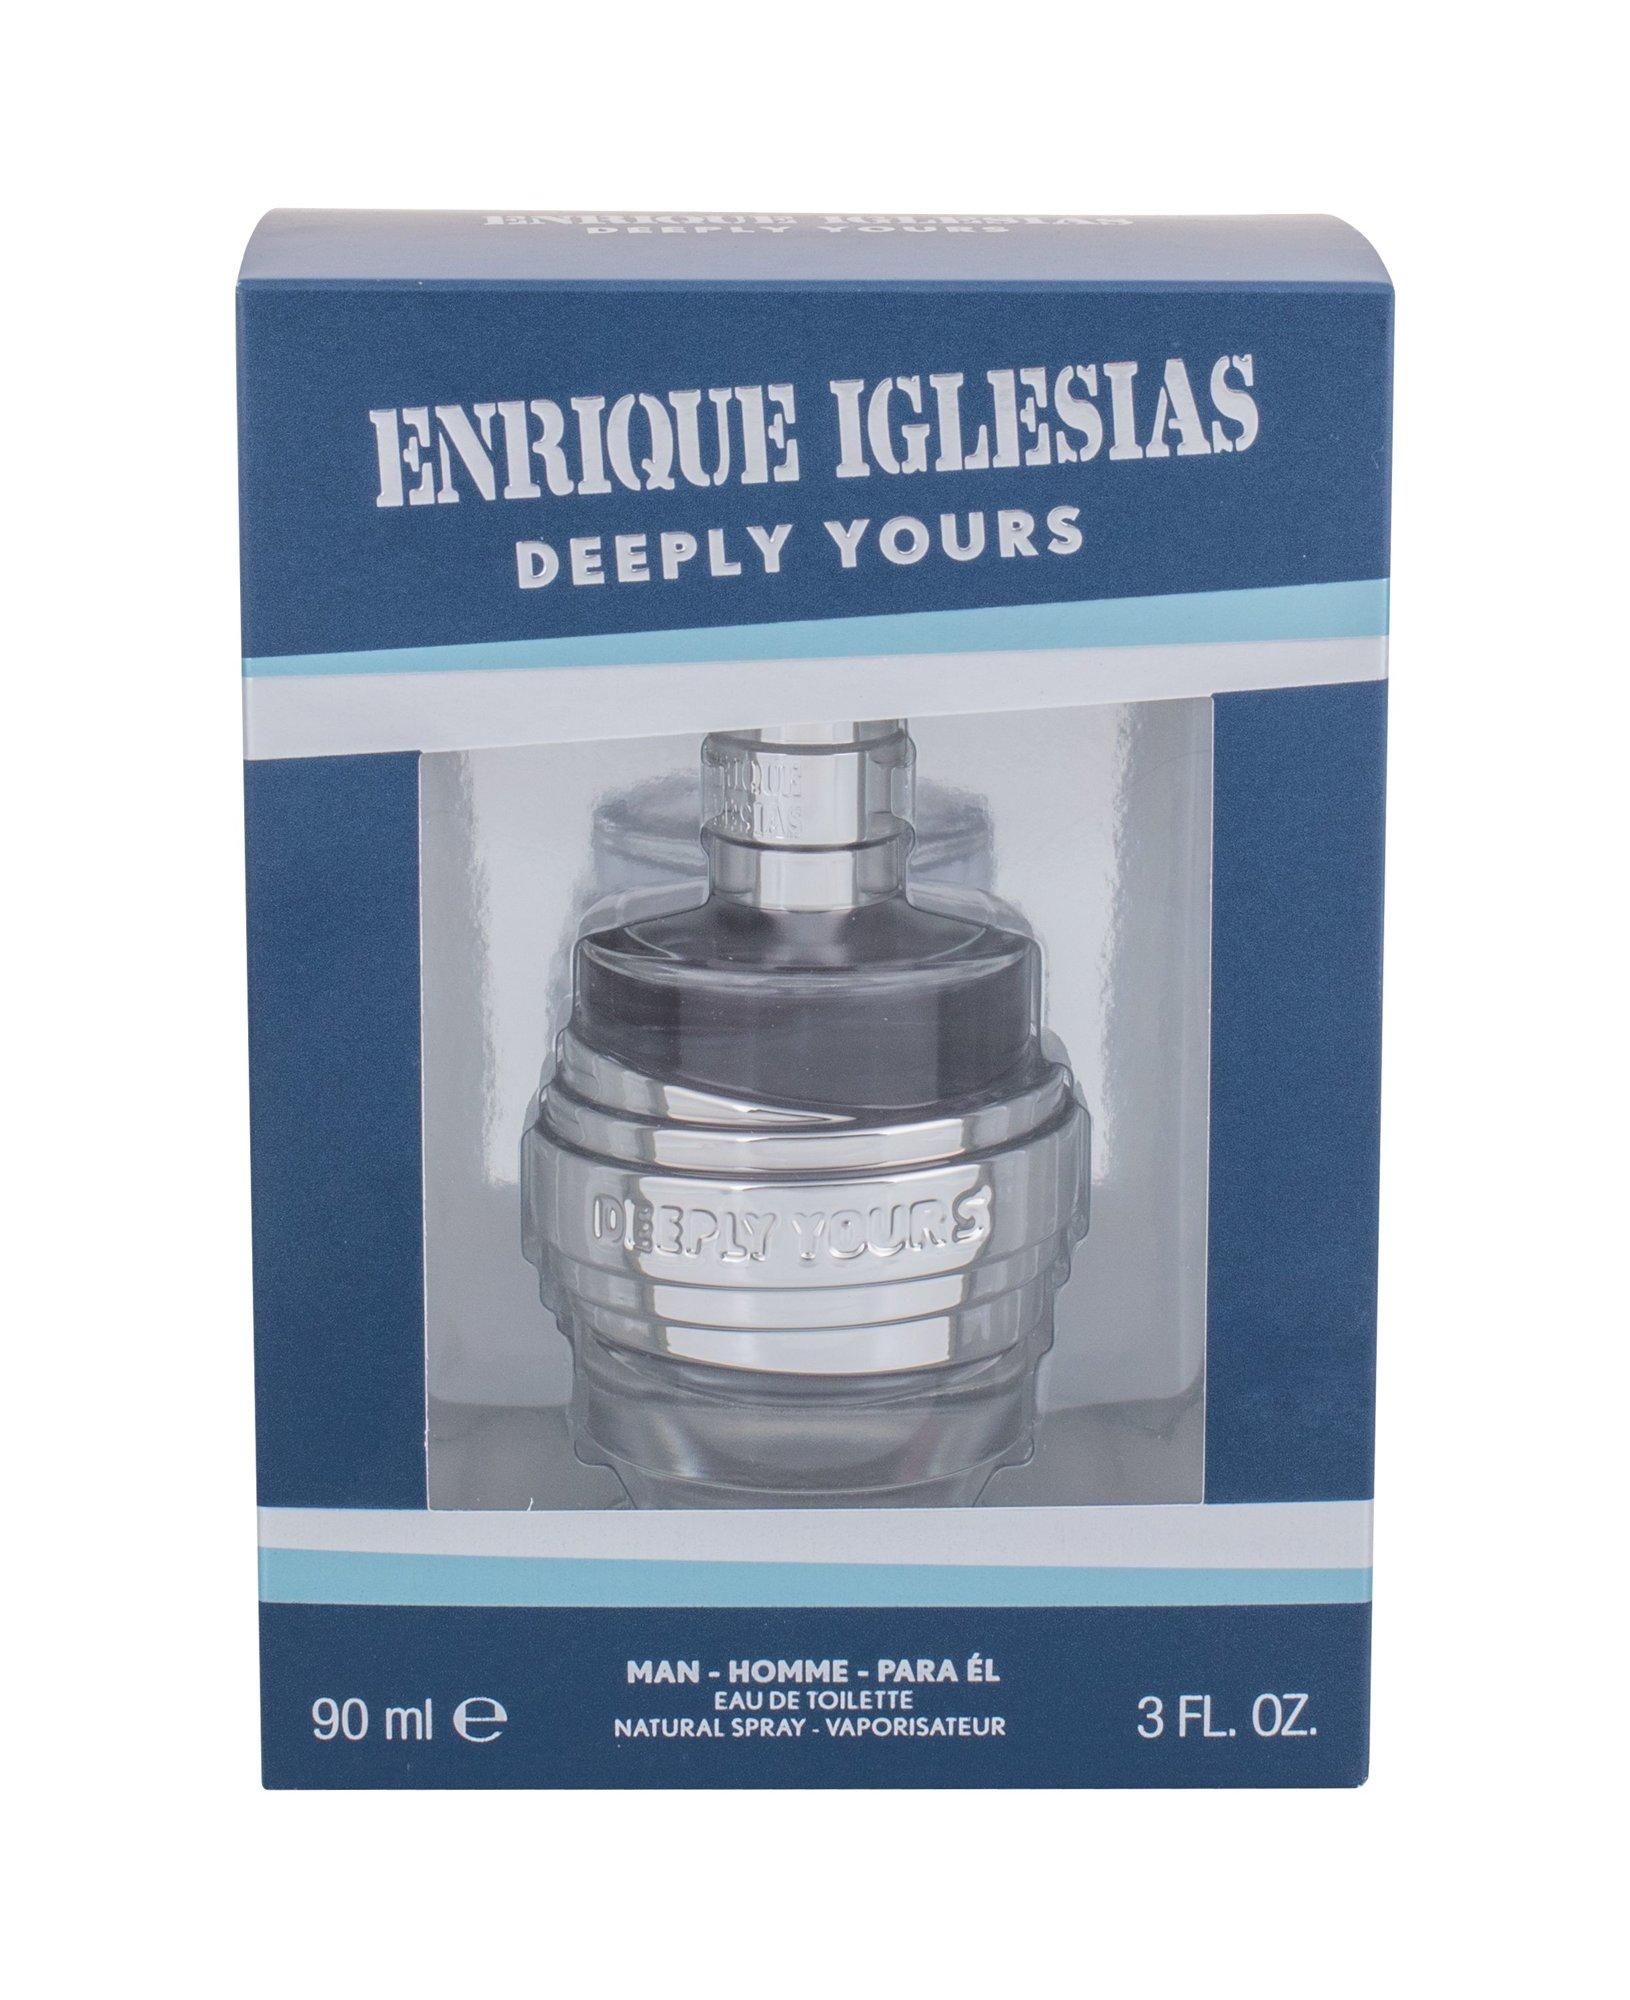 Kvepalai Enrique Iglesias Deeply Yours